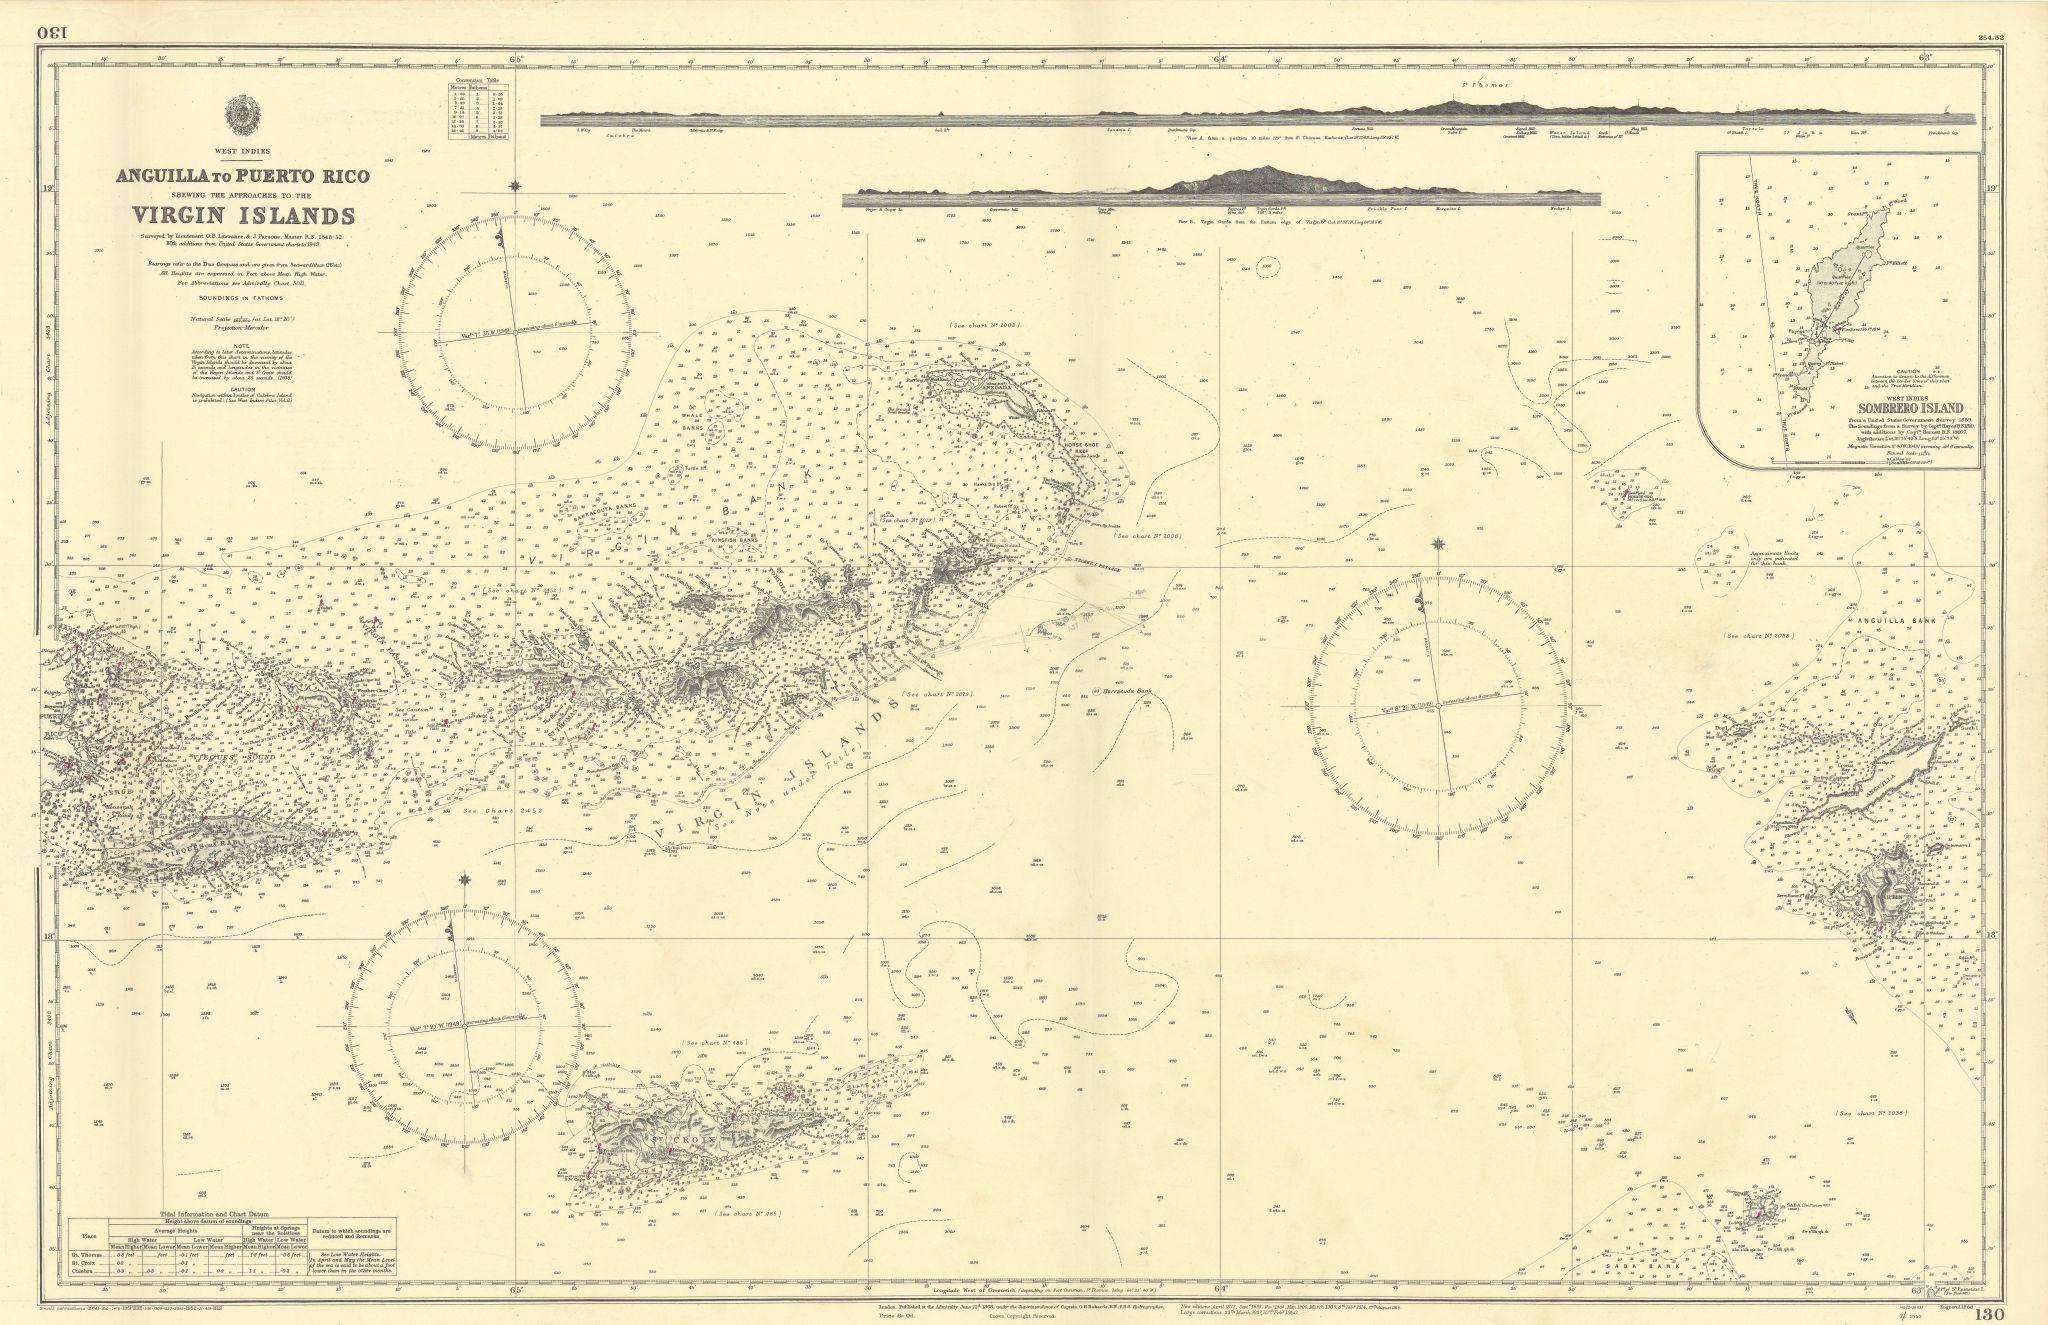 Anegada Passage Virgin Islands St Martin ADMIRALTY chart 1868 (1952) old map